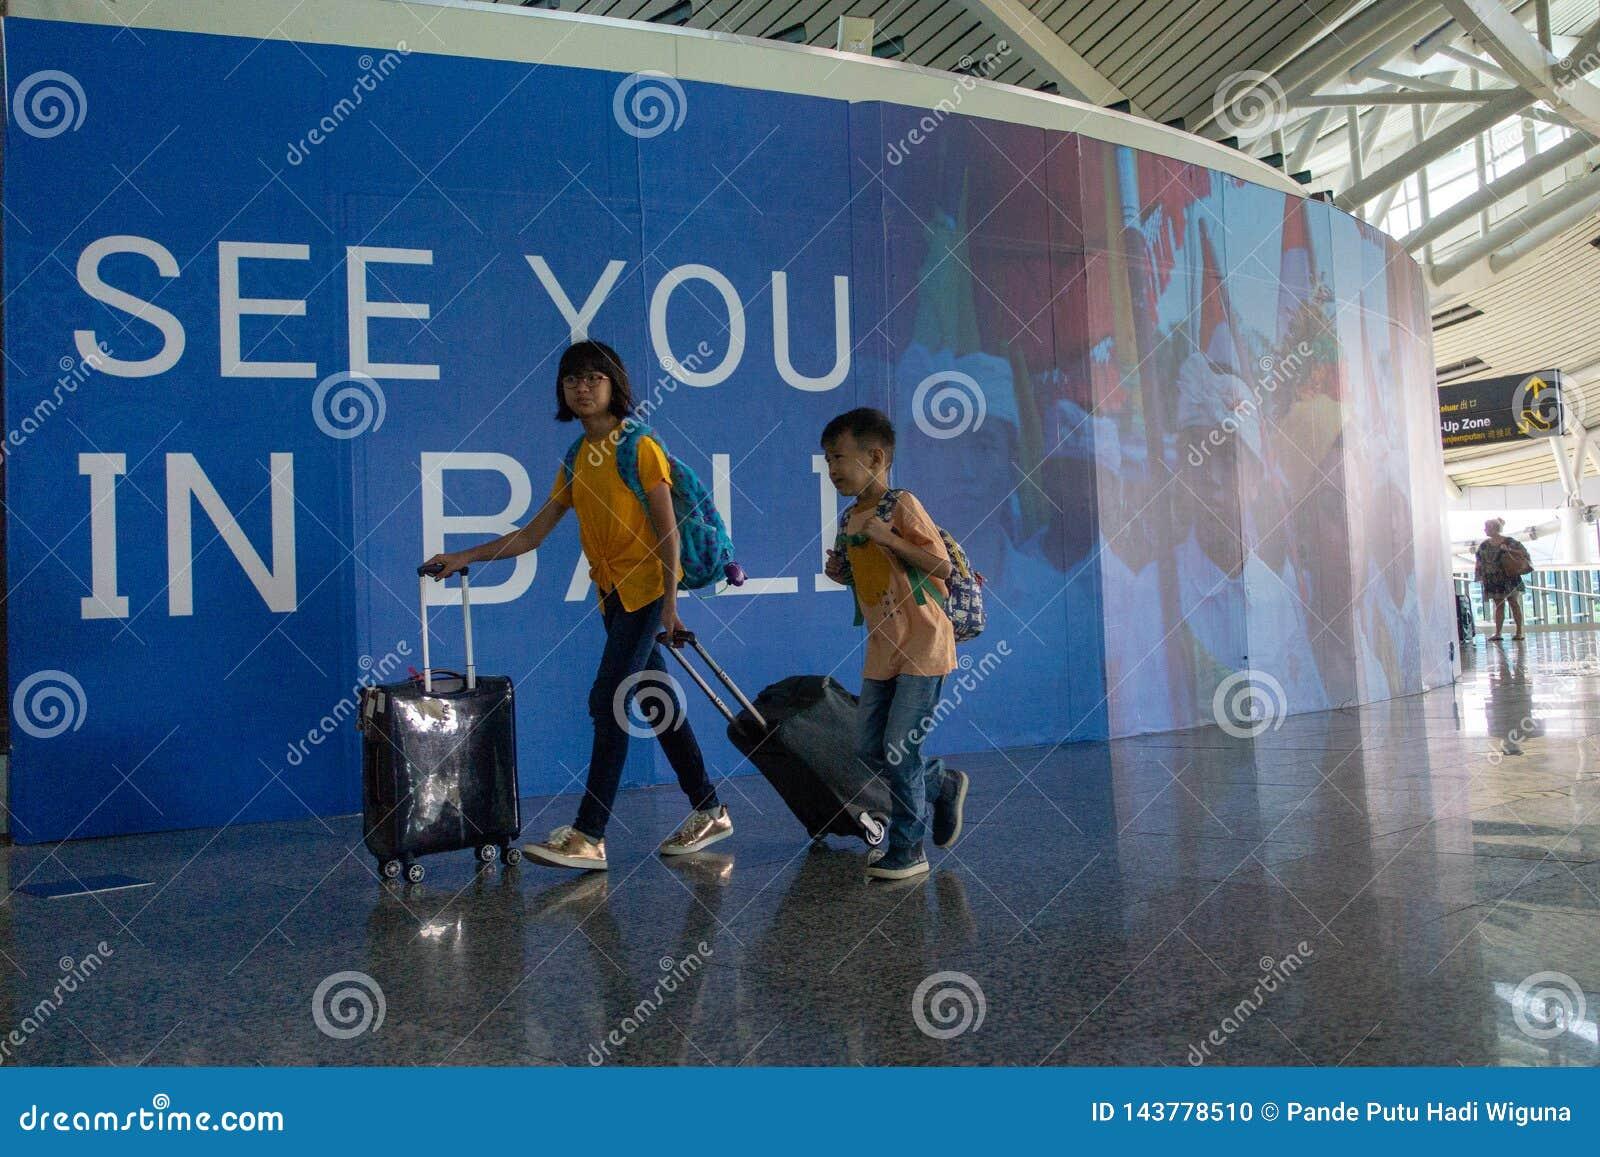 BADUNG,BALI/INDONESIA-June 25 2018: Two young traveller bring their suitcases to departure terminal at Ngurah Rai Bali